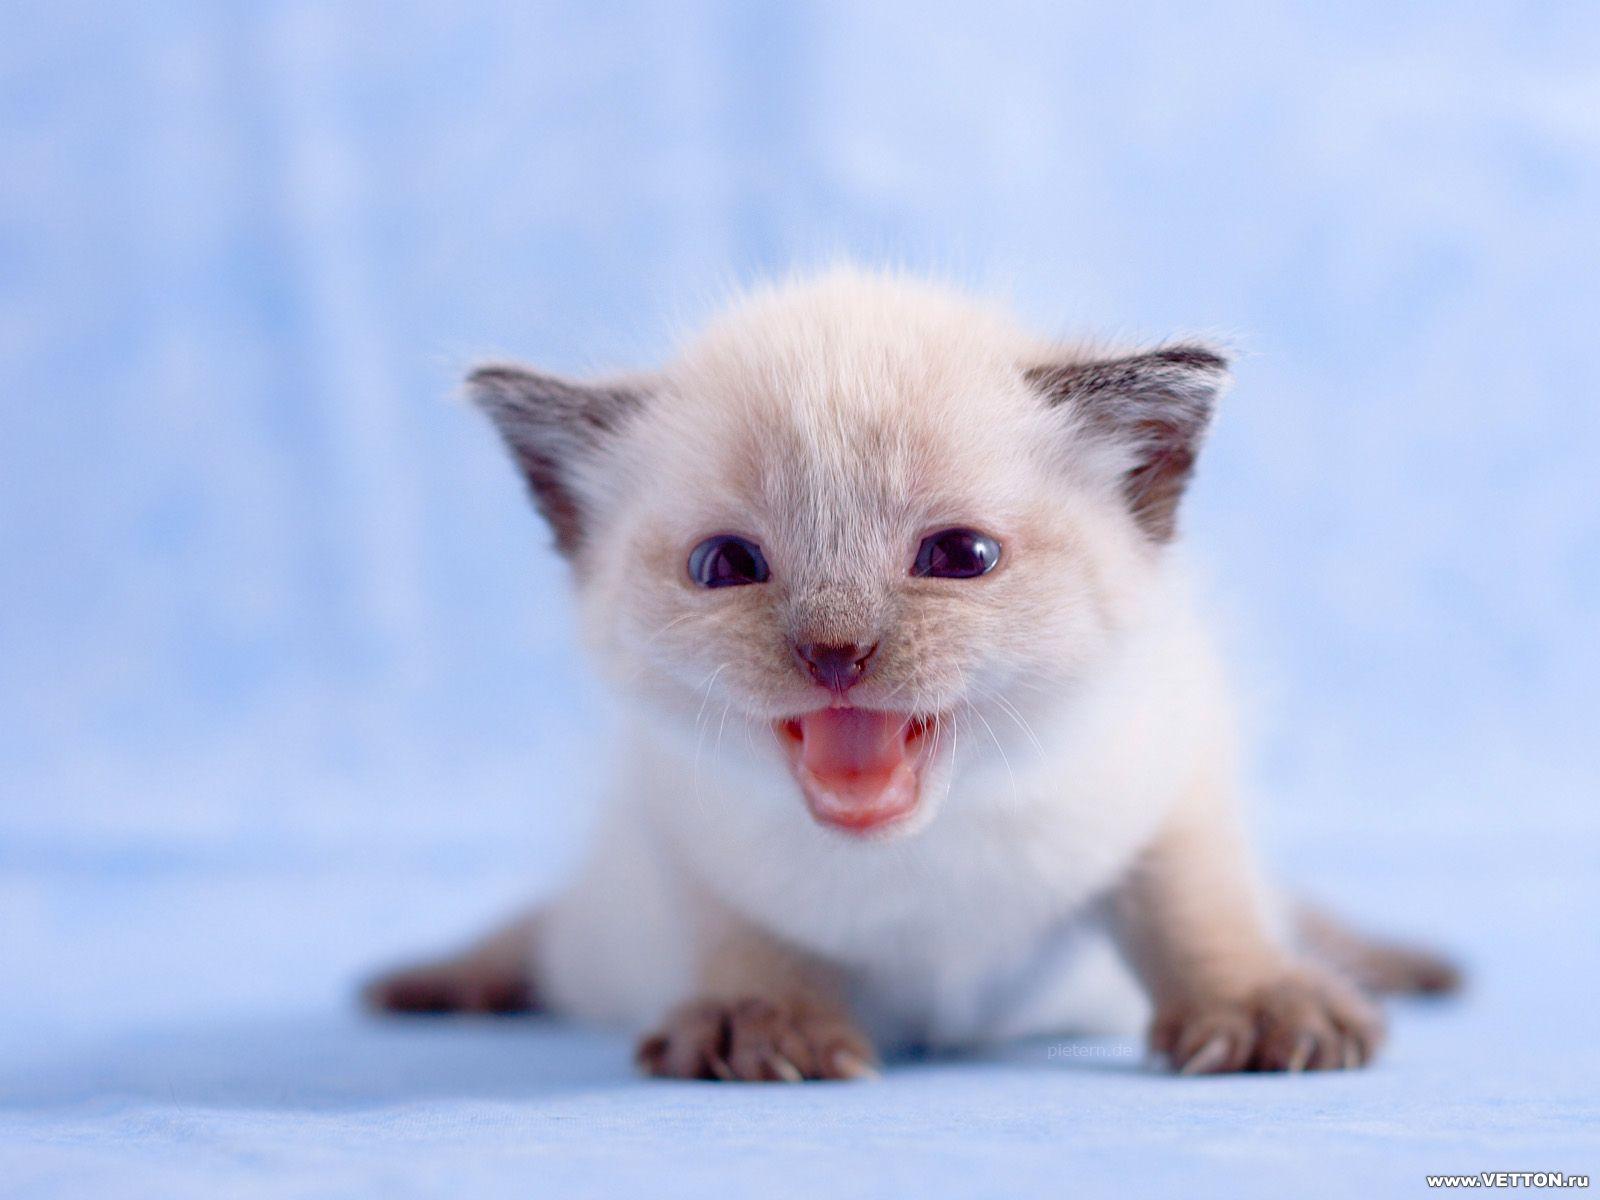 cute cat for 1440x900 - photo #36